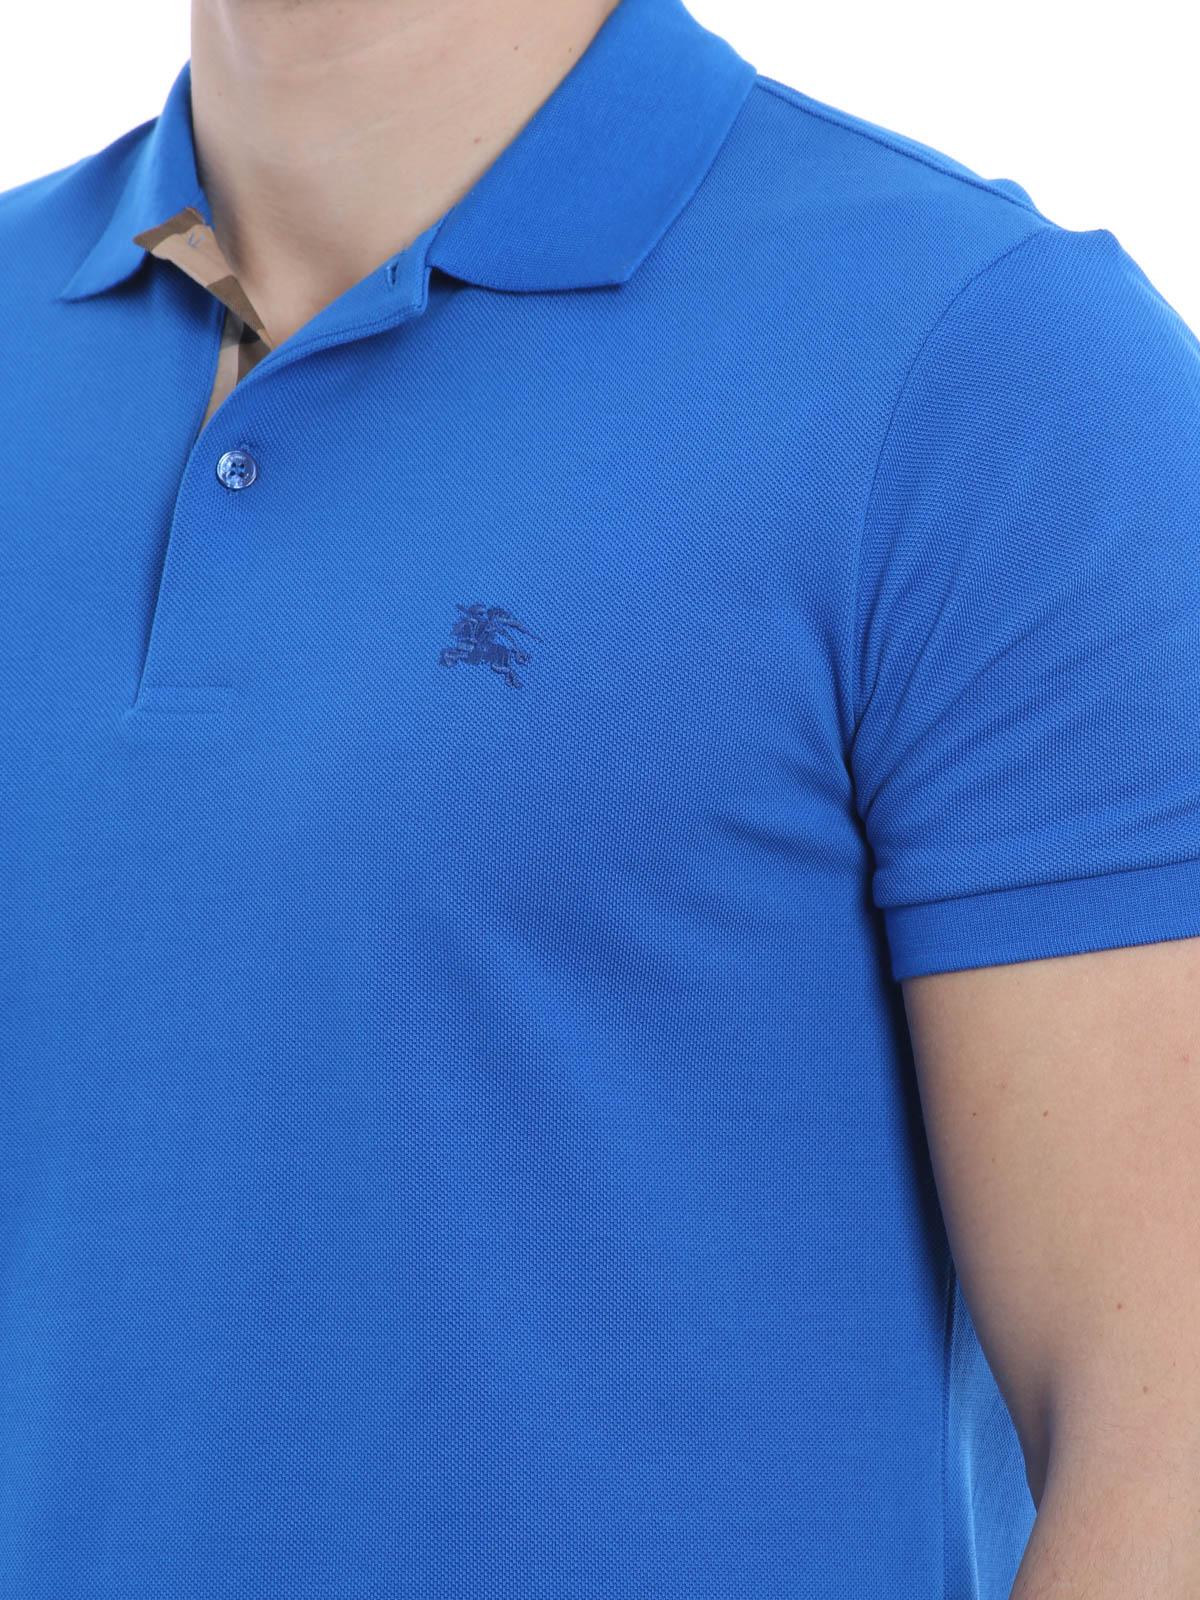 Burberry Cotton Pique Polo Shirt Polo Shirts 3974314 Ikrix